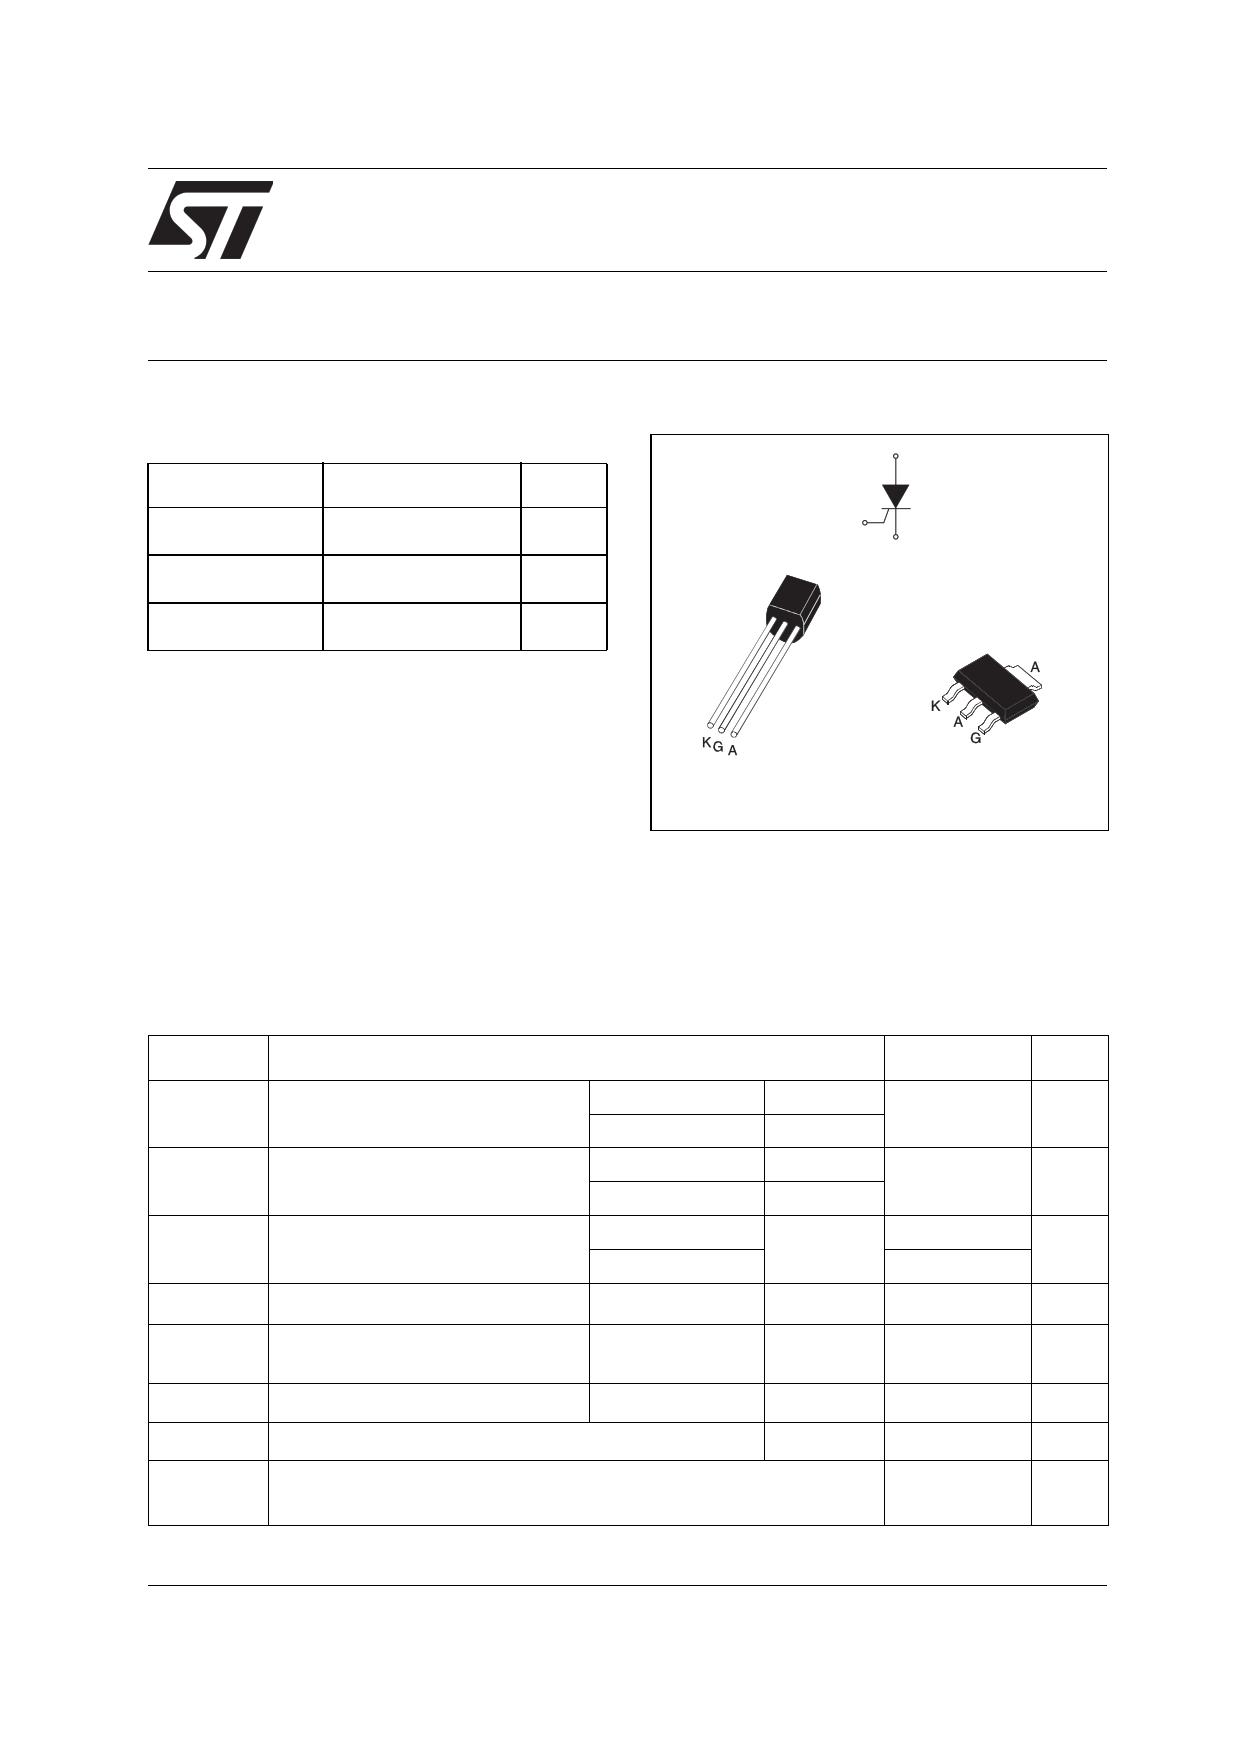 P0102DN2AL3 datasheet